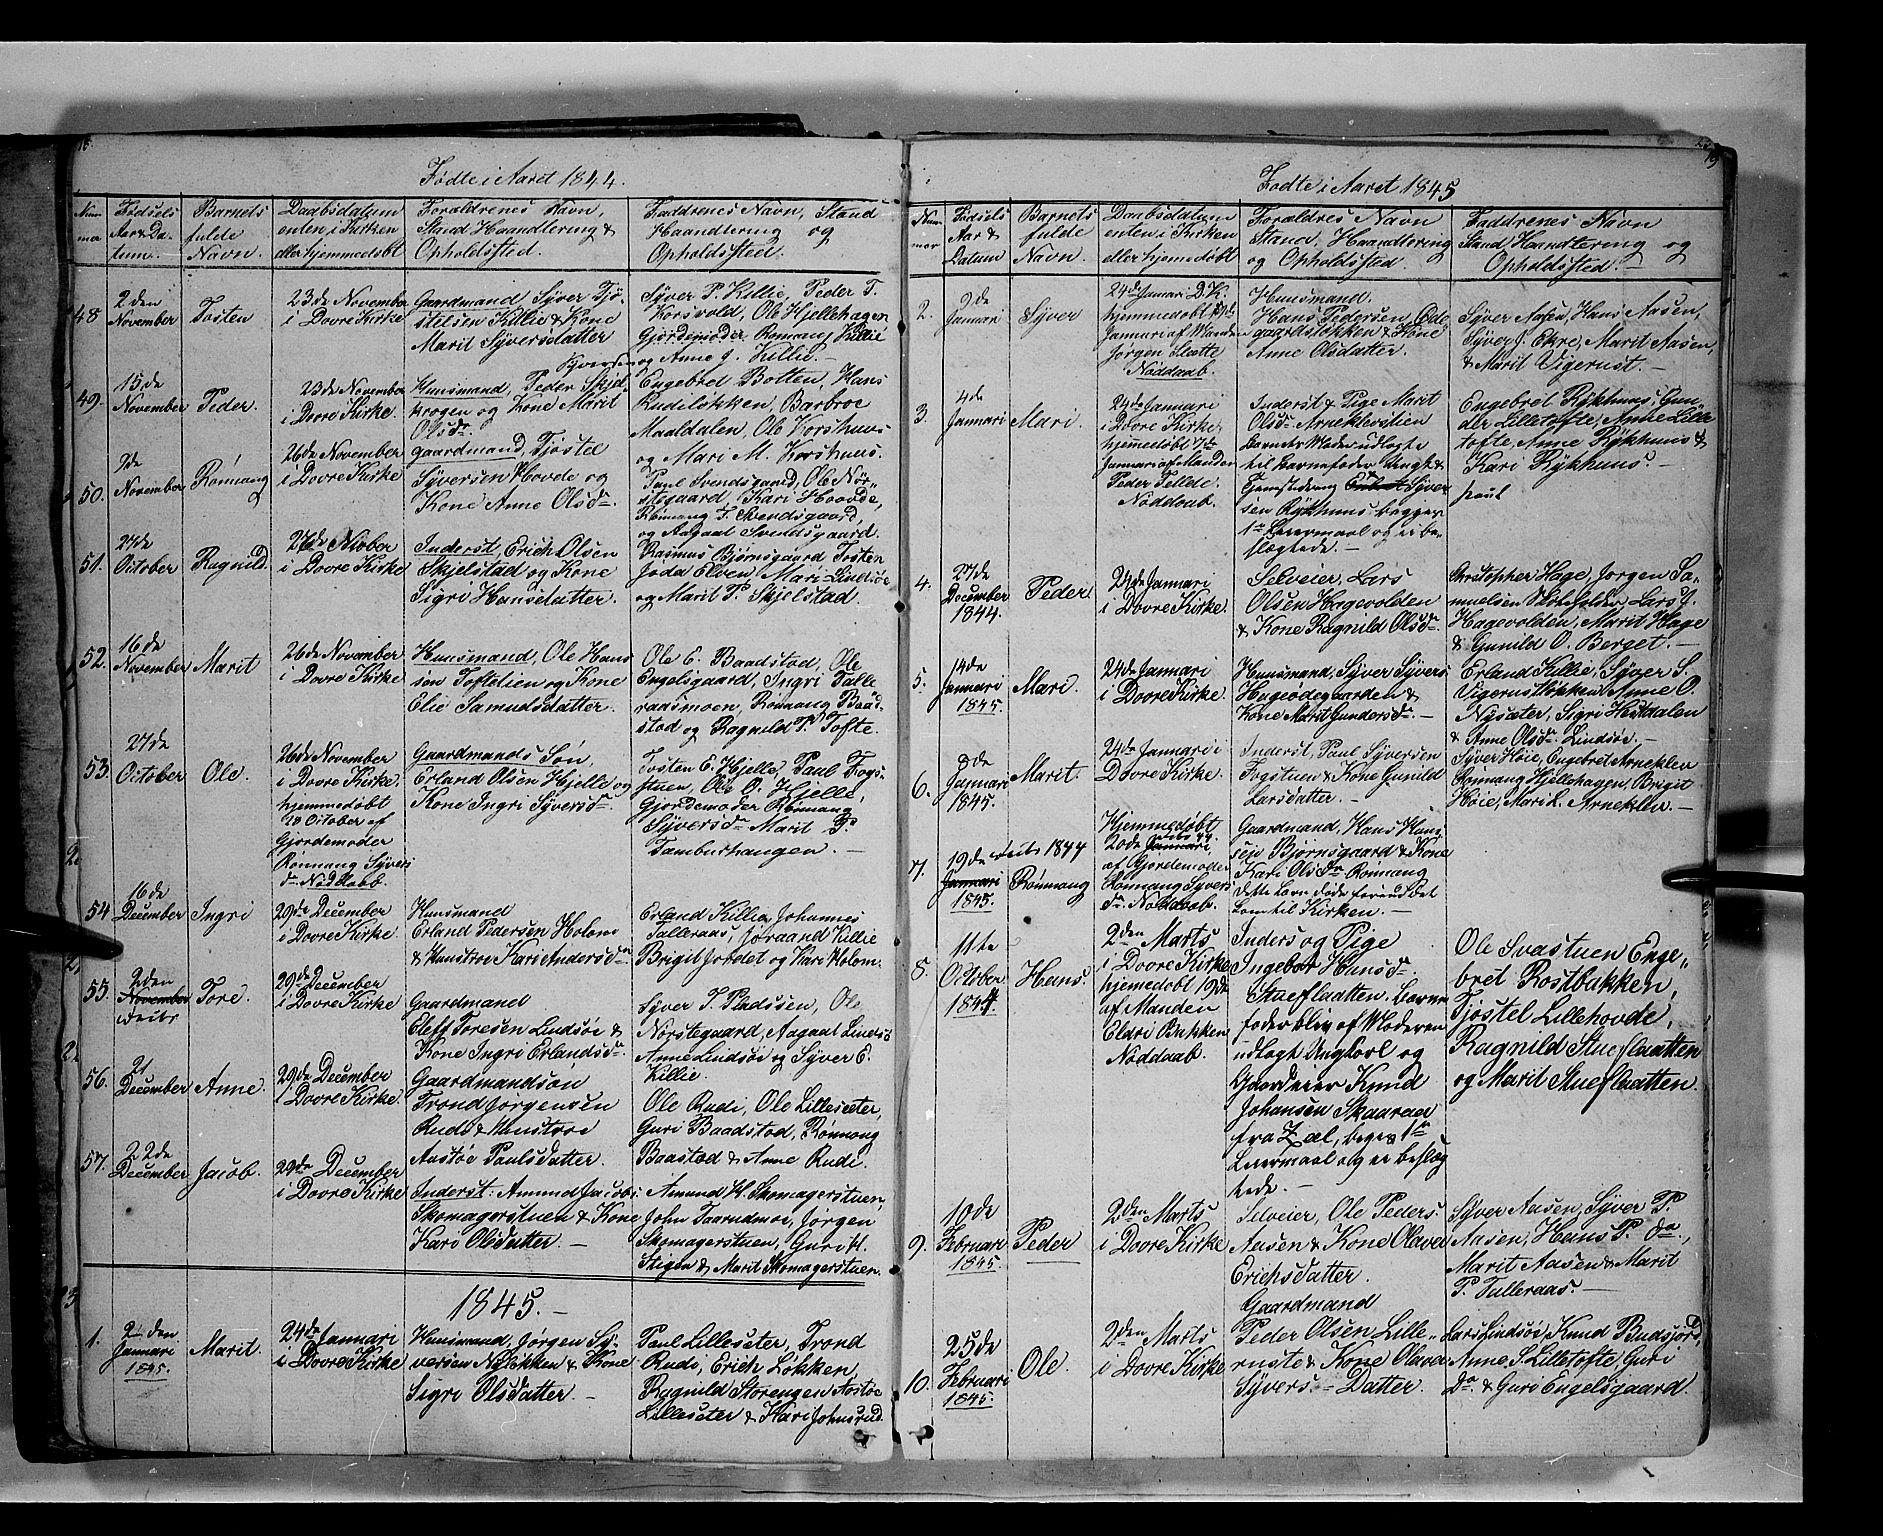 SAH, Lesja prestekontor, Klokkerbok nr. 3, 1842-1862, s. 18-19